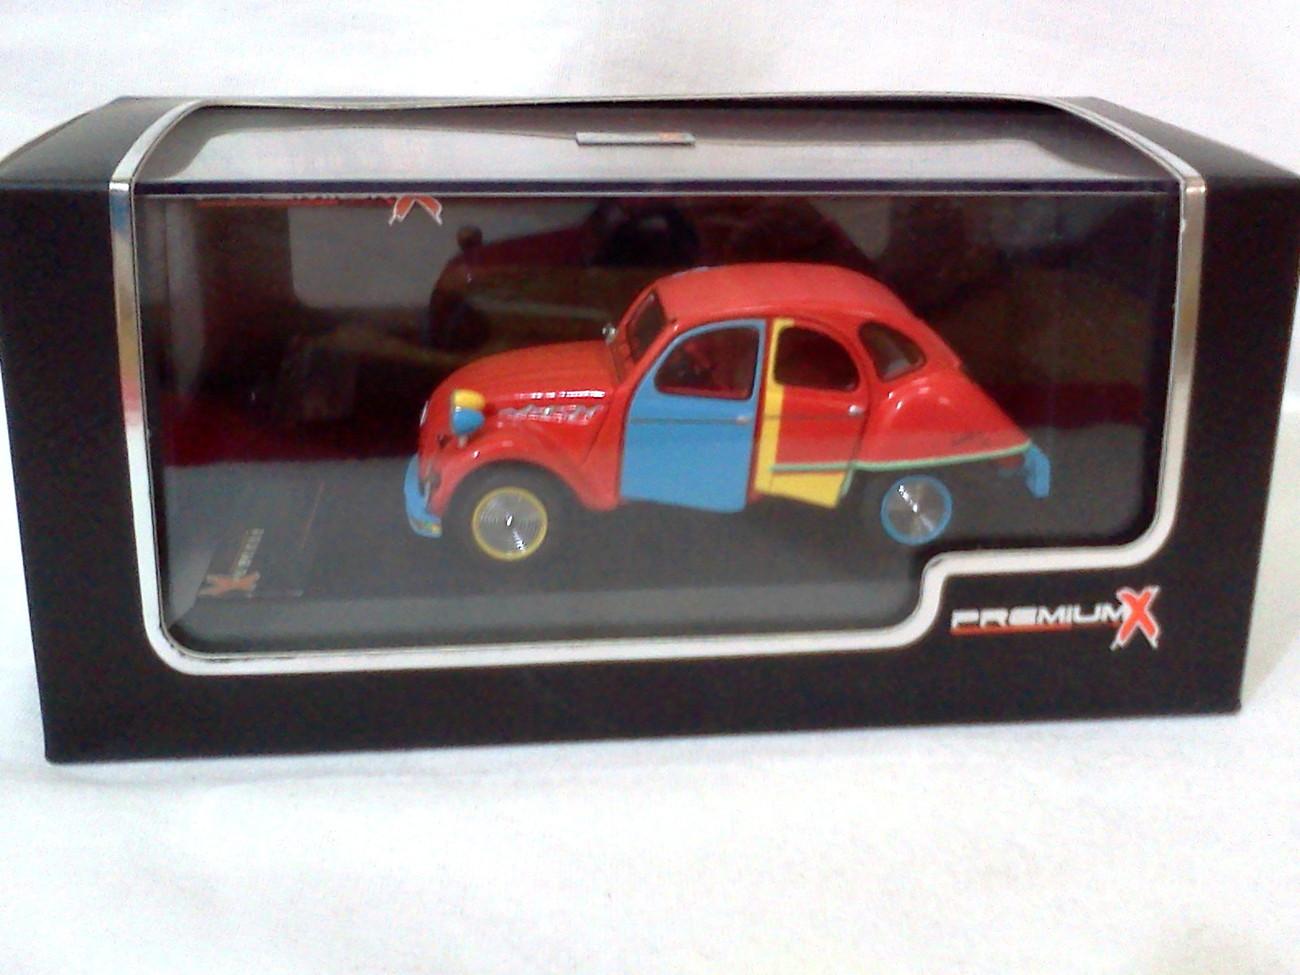 Citroen 2CV Picasso 2007 red hight quality 1/43 Resin Model Car